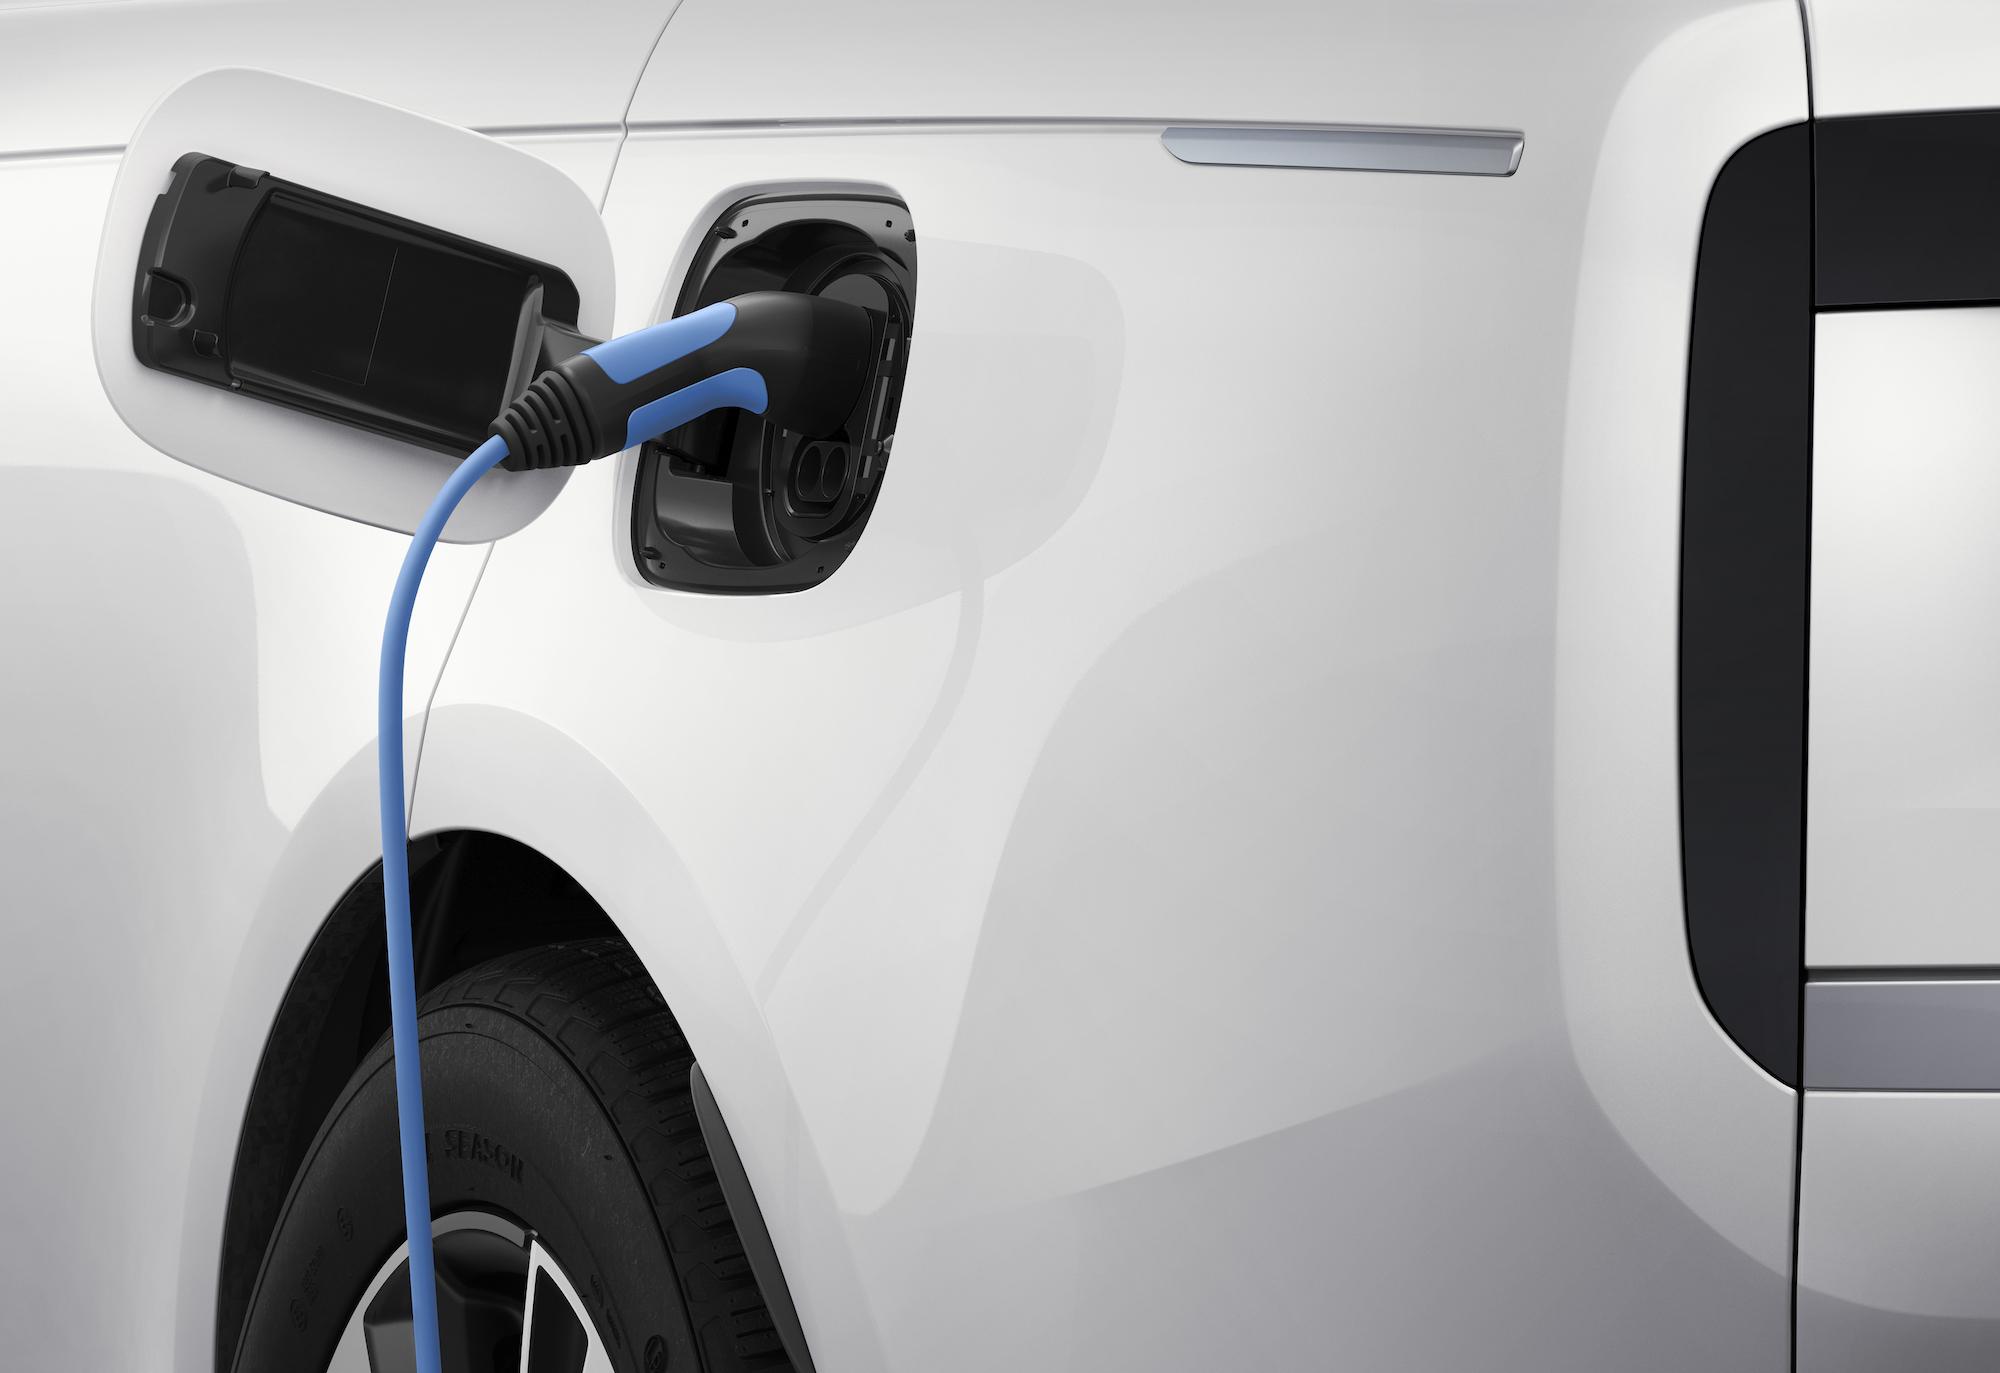 Range Rover plug in hybrid electric SUV 2023